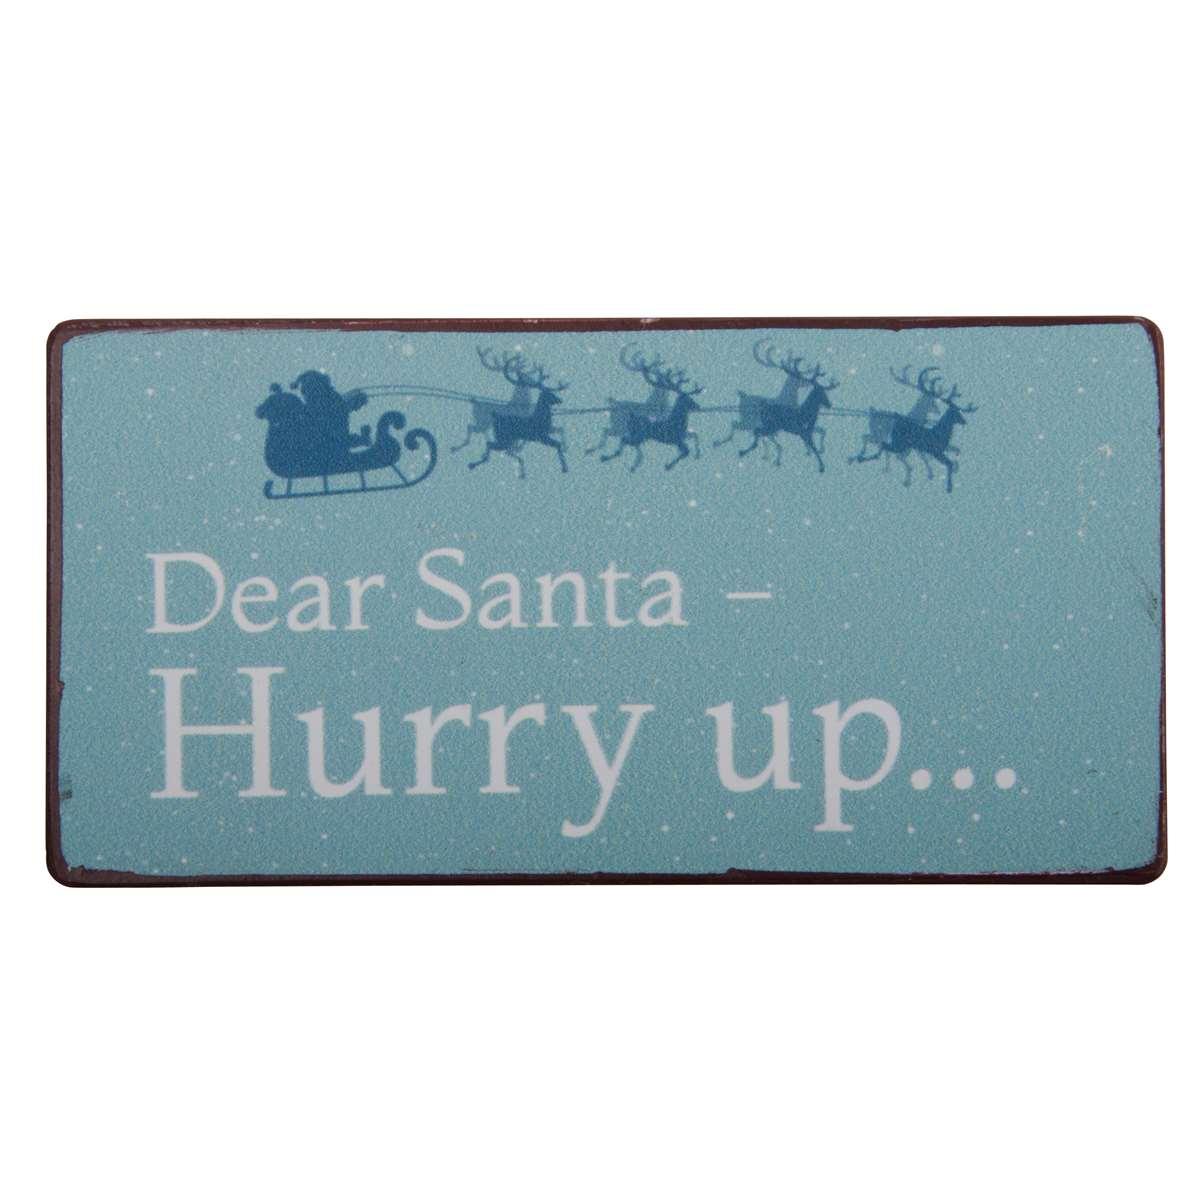 Witzigschilder - Magnet Dear Santa Hurry up... Ib Laursen Aps - Onlineshop Tante Emmer